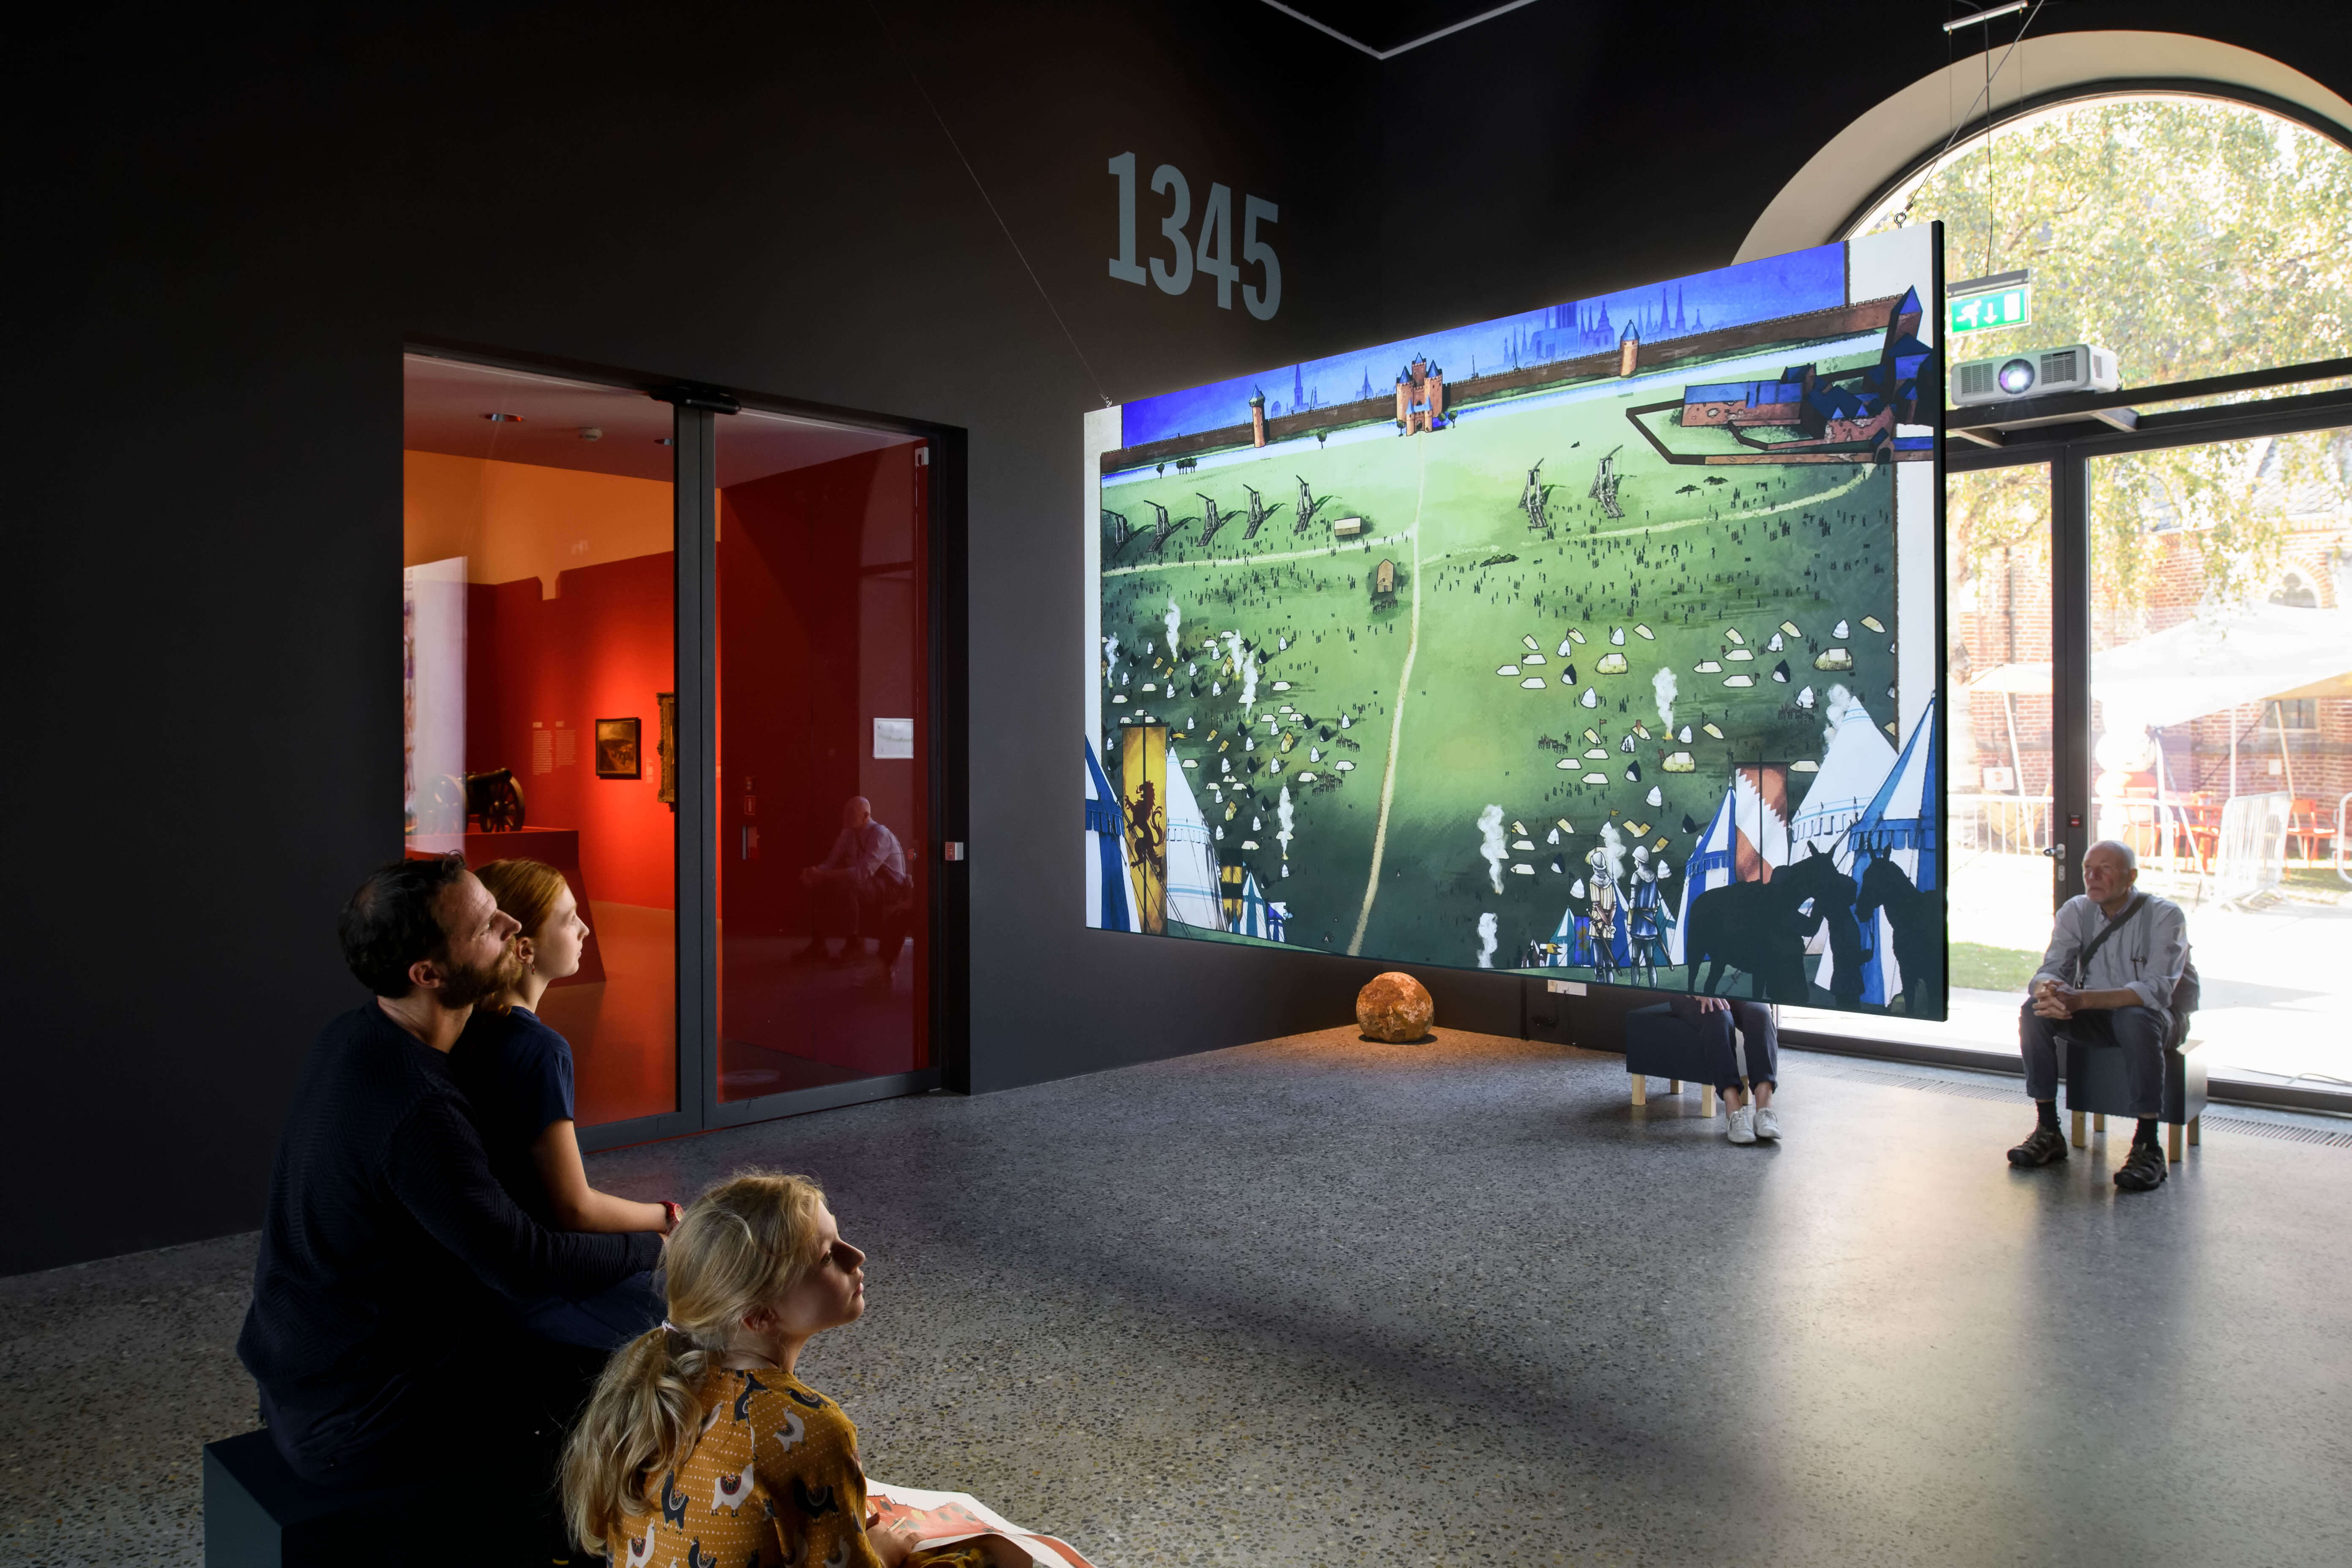 tentoonstelling de ommuurde stad centraal museum t jpg